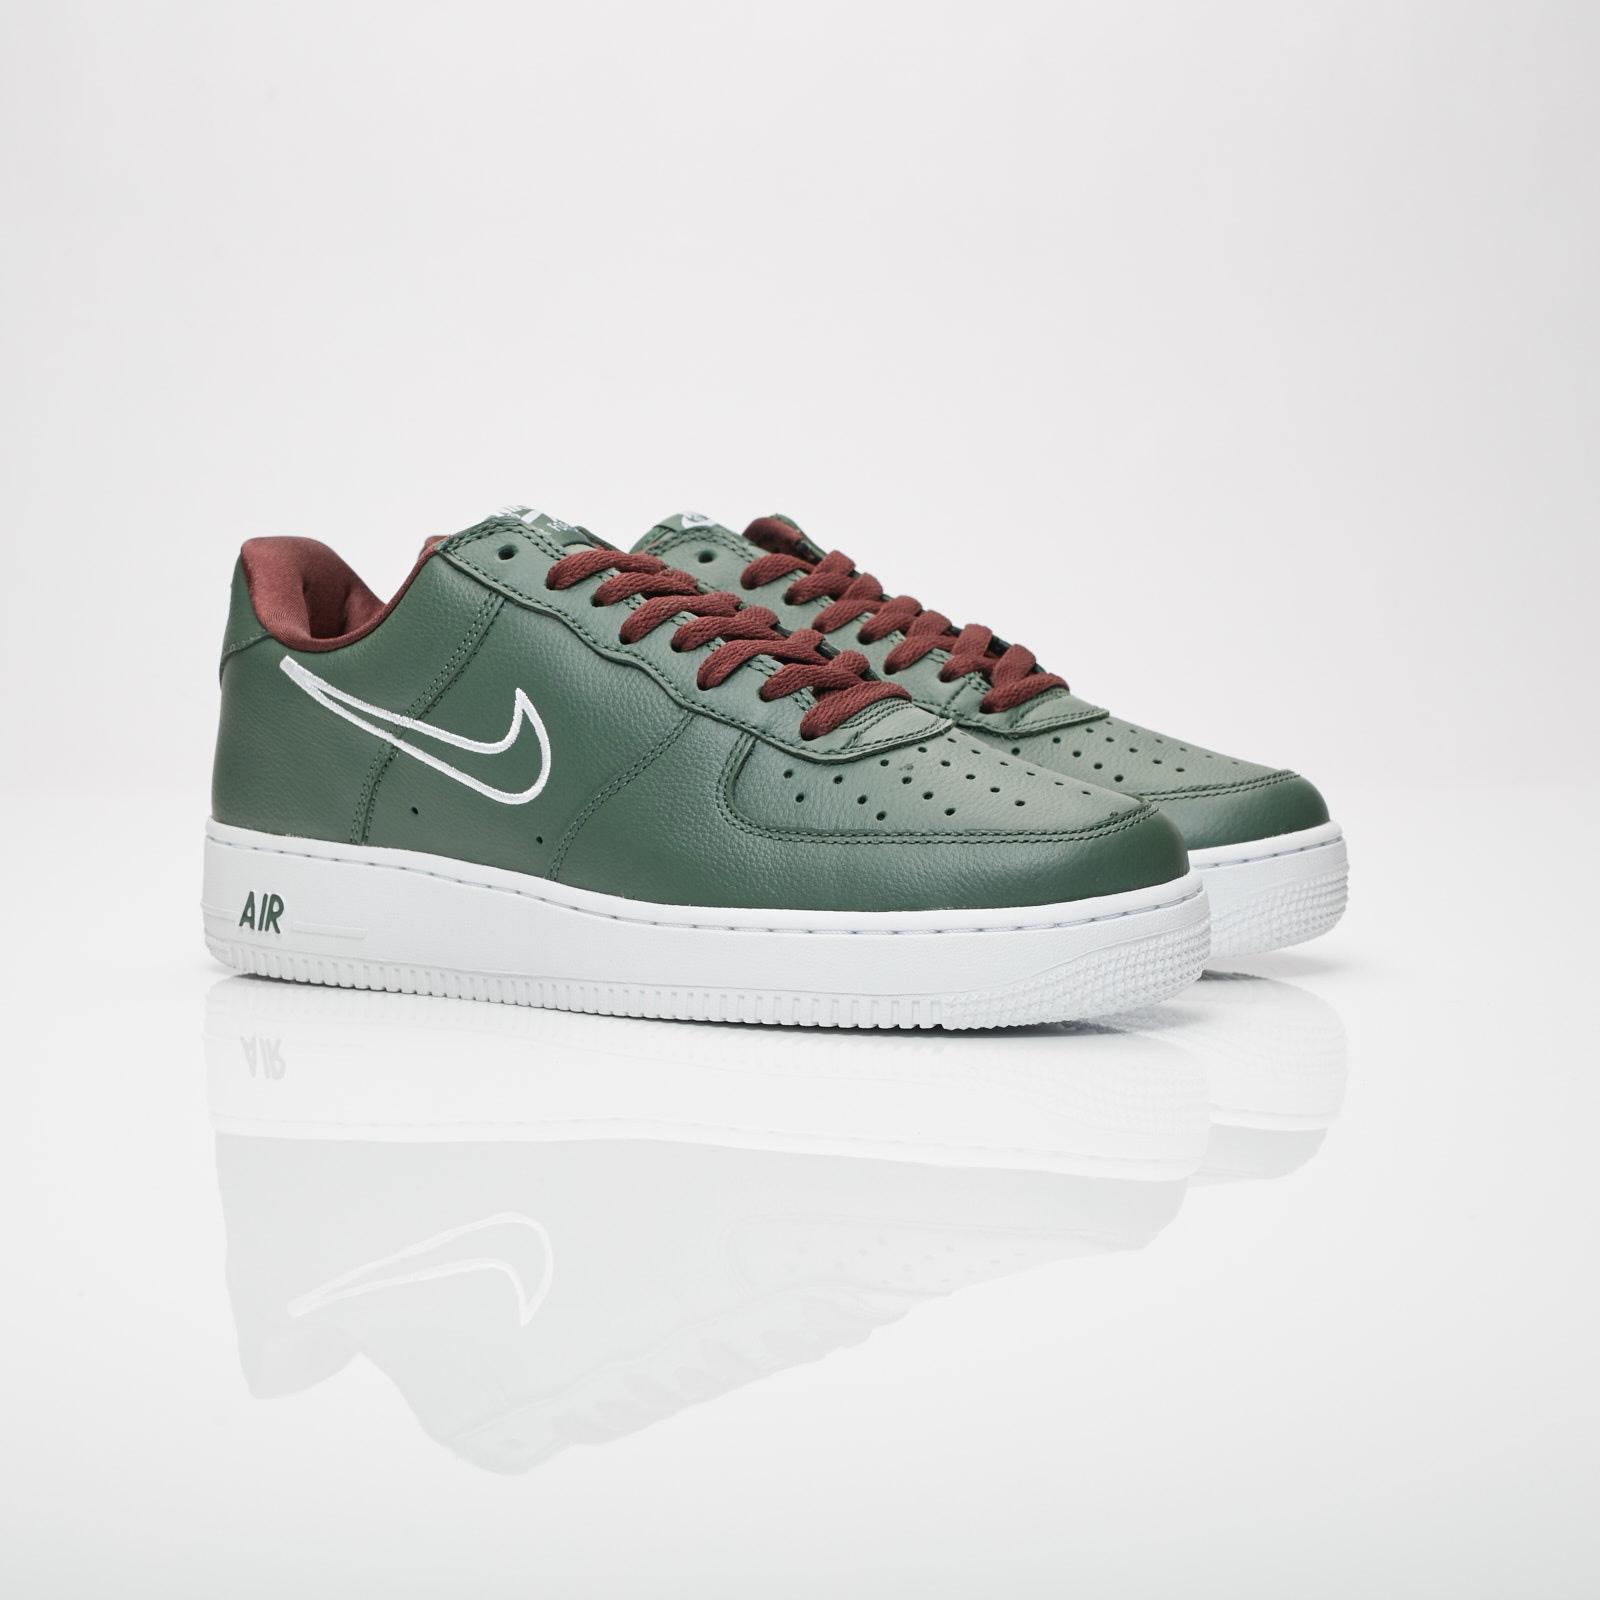 meilleure sélection ded17 3568a Nike Air Force 1 Low Retro Hong Kong - 845053-300 ...